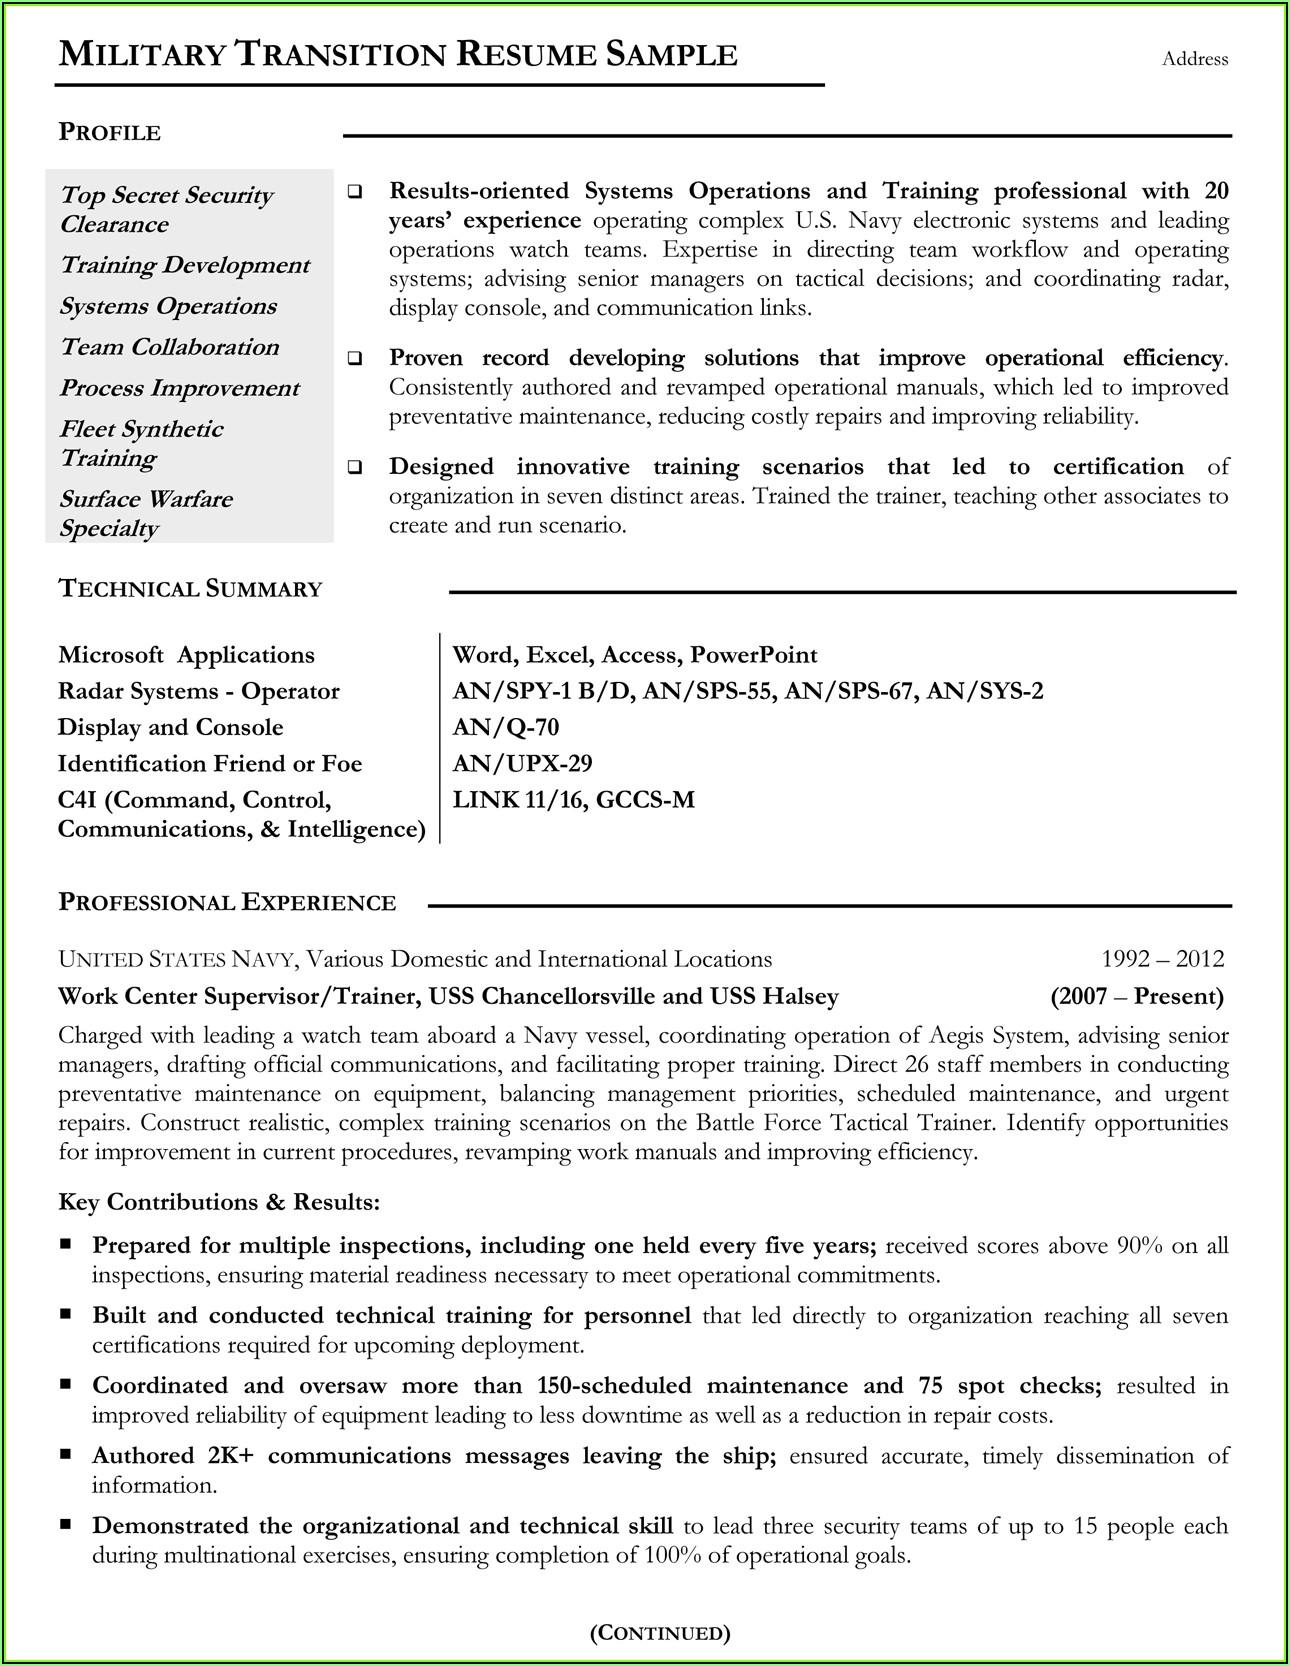 Vets.gov Resume Builder